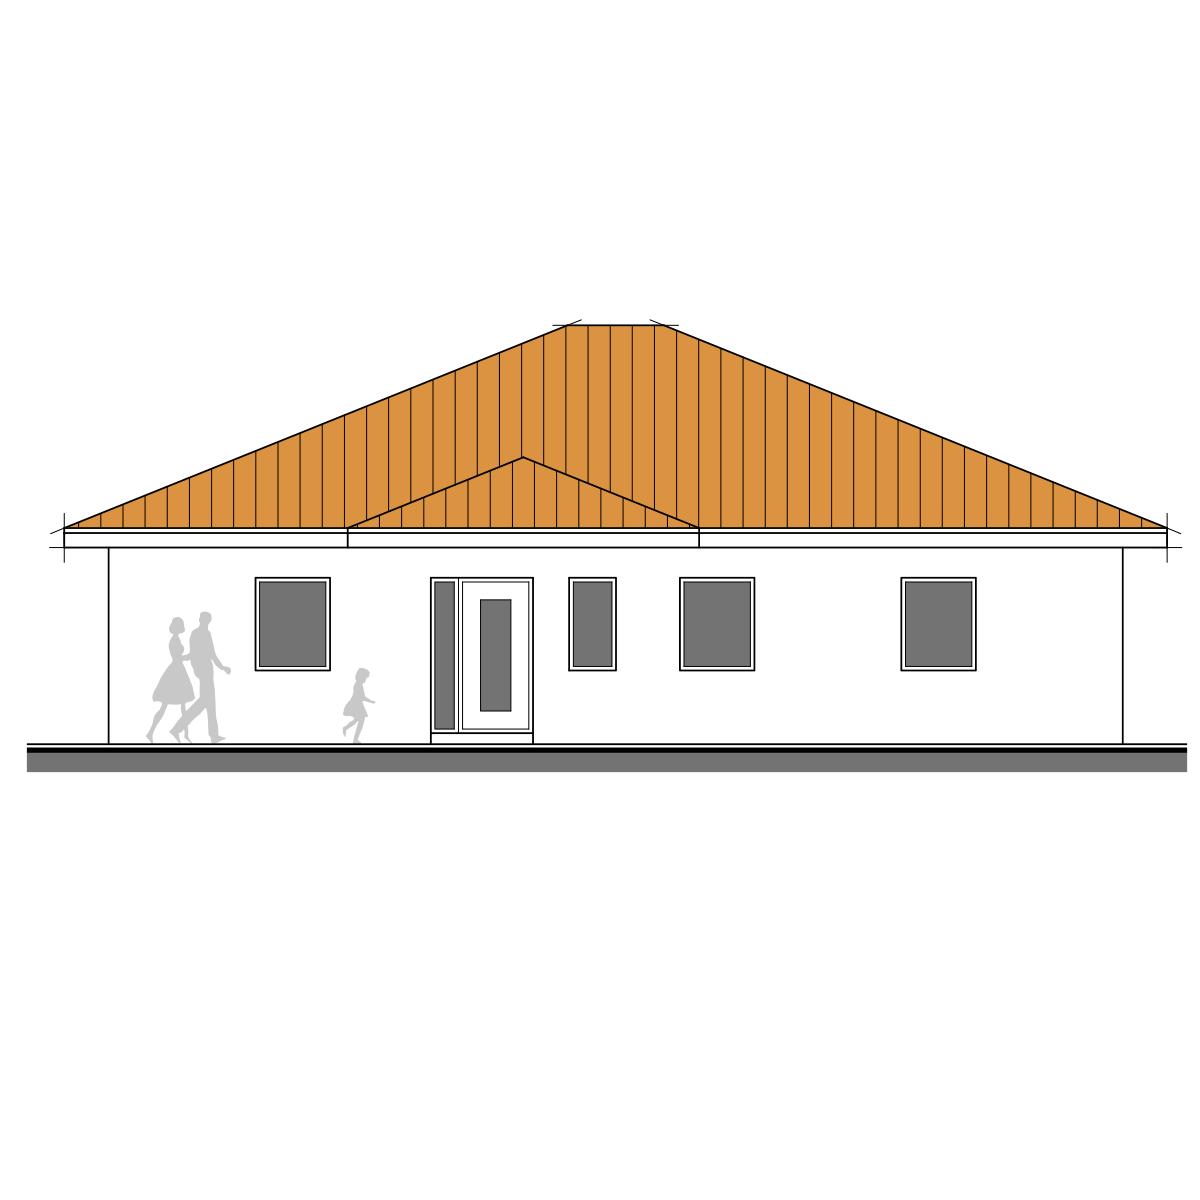 Begehbare Dusche Gr??e : Begehbare Dusche Bodenplatte : RKR Musterhaus BUNGALOW 137